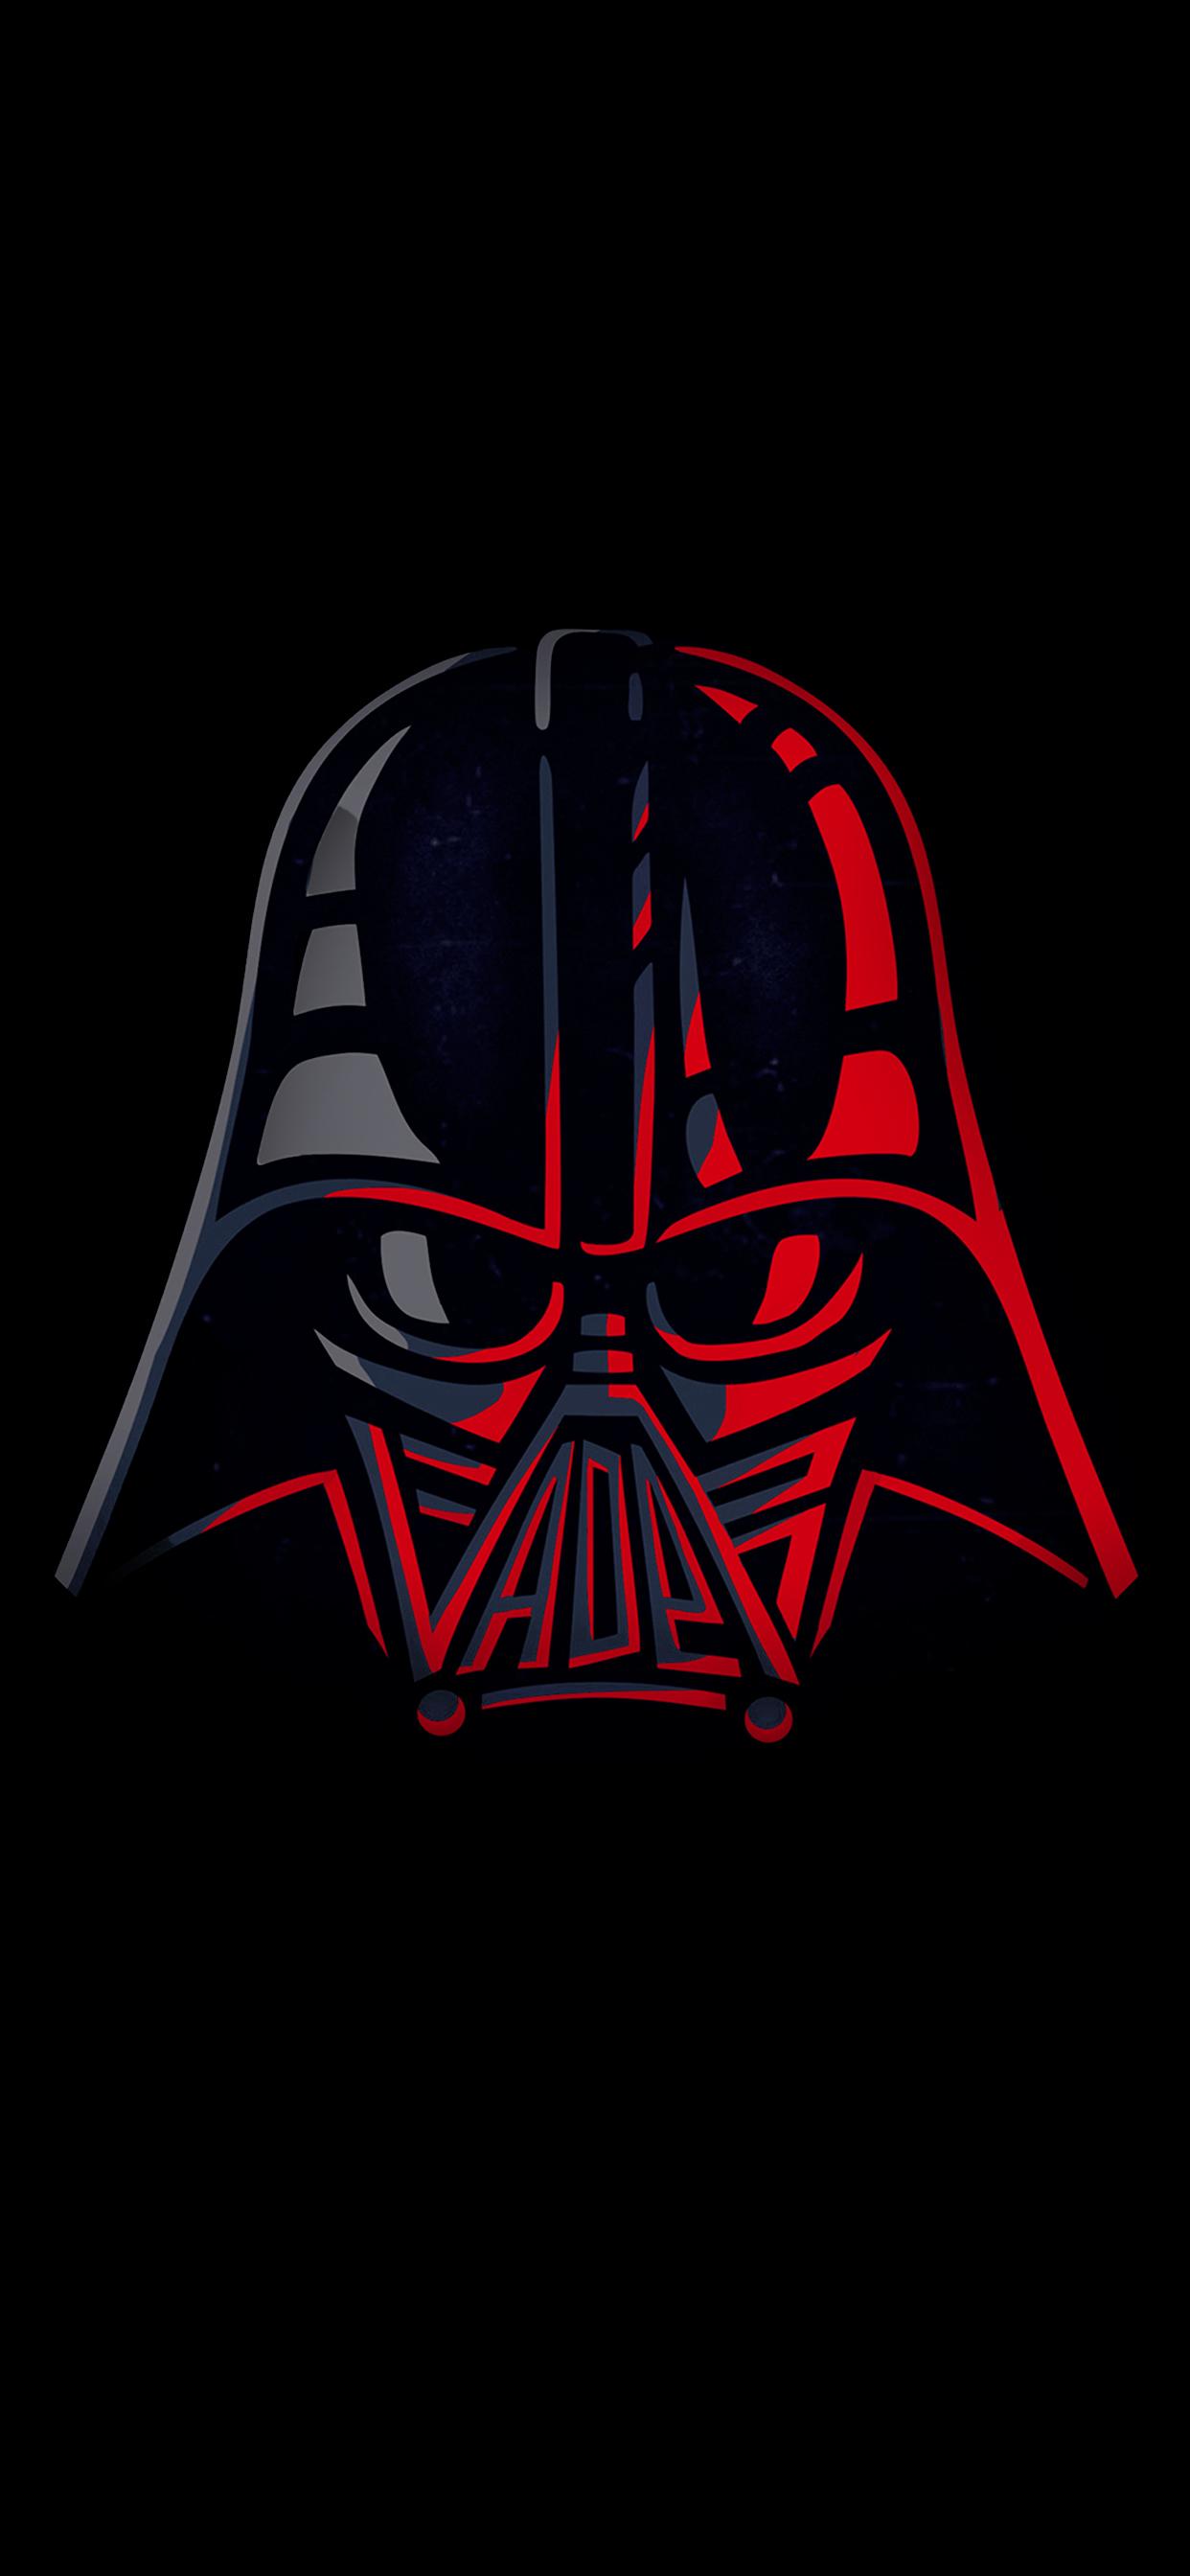 Darth Vader Oled Wallpaper Iphone Heroscreen Cool Wallpapers